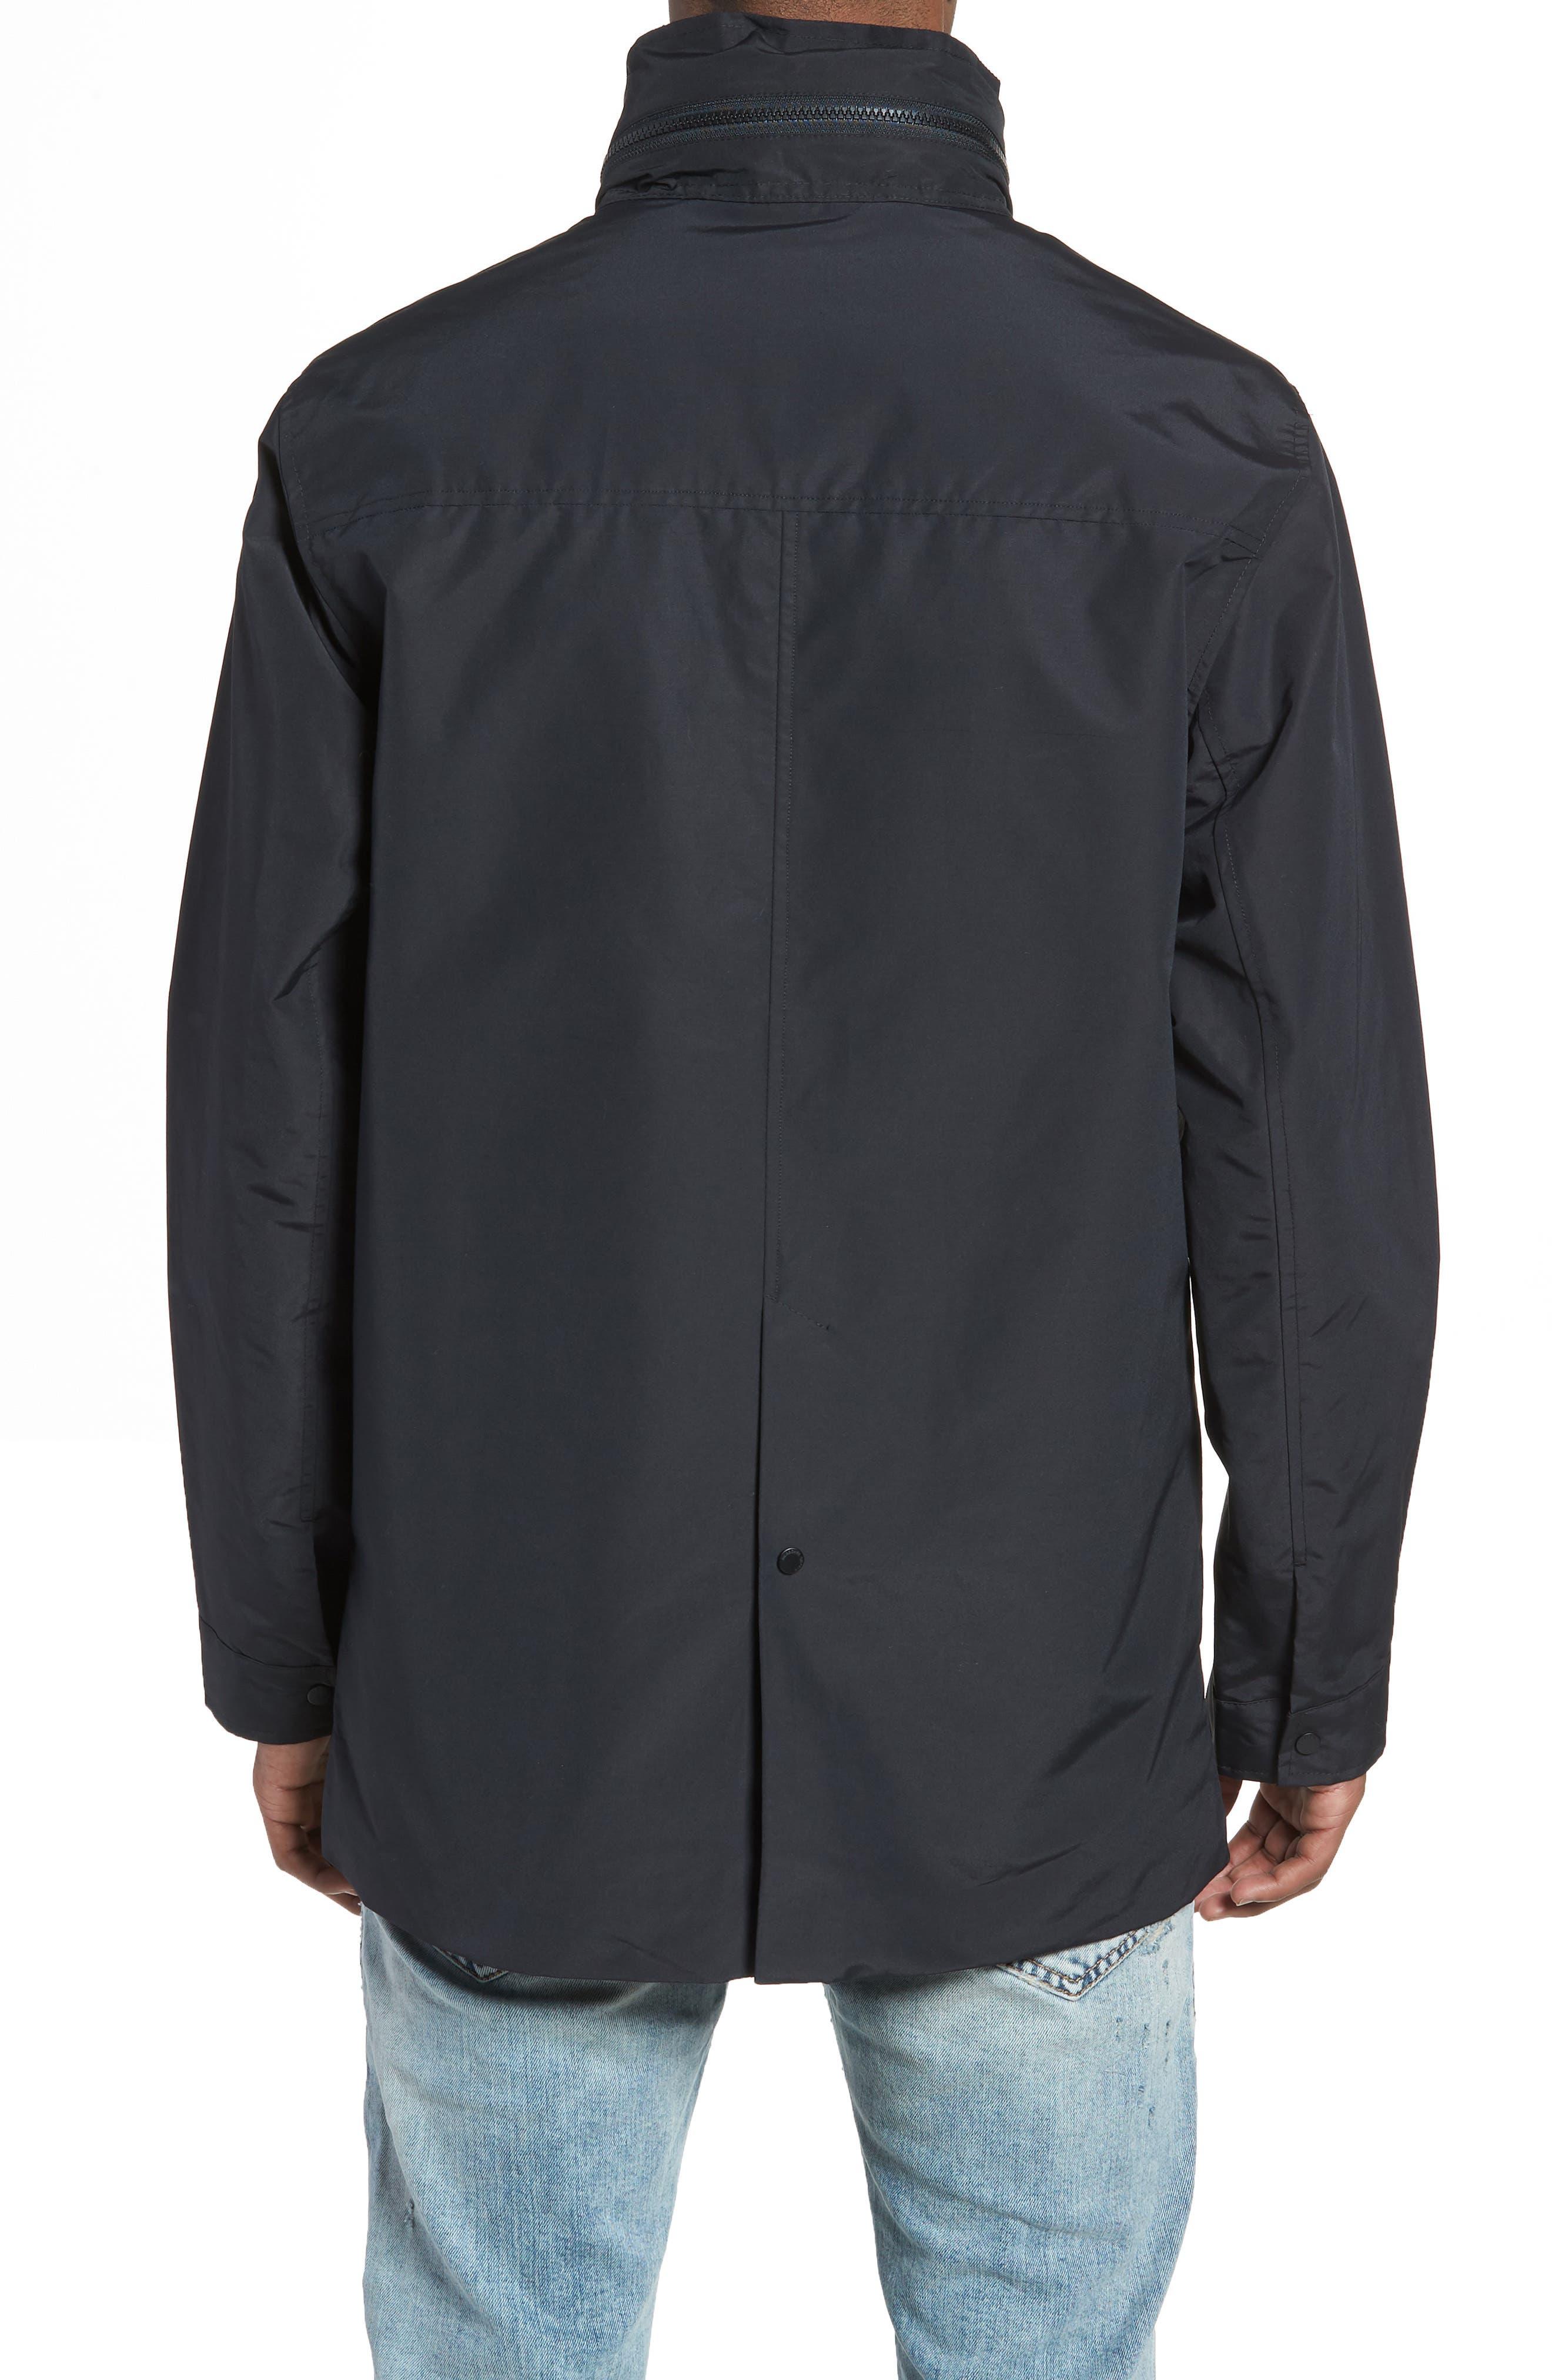 Stowaway Mac Jacket,                             Alternate thumbnail 2, color,                             001